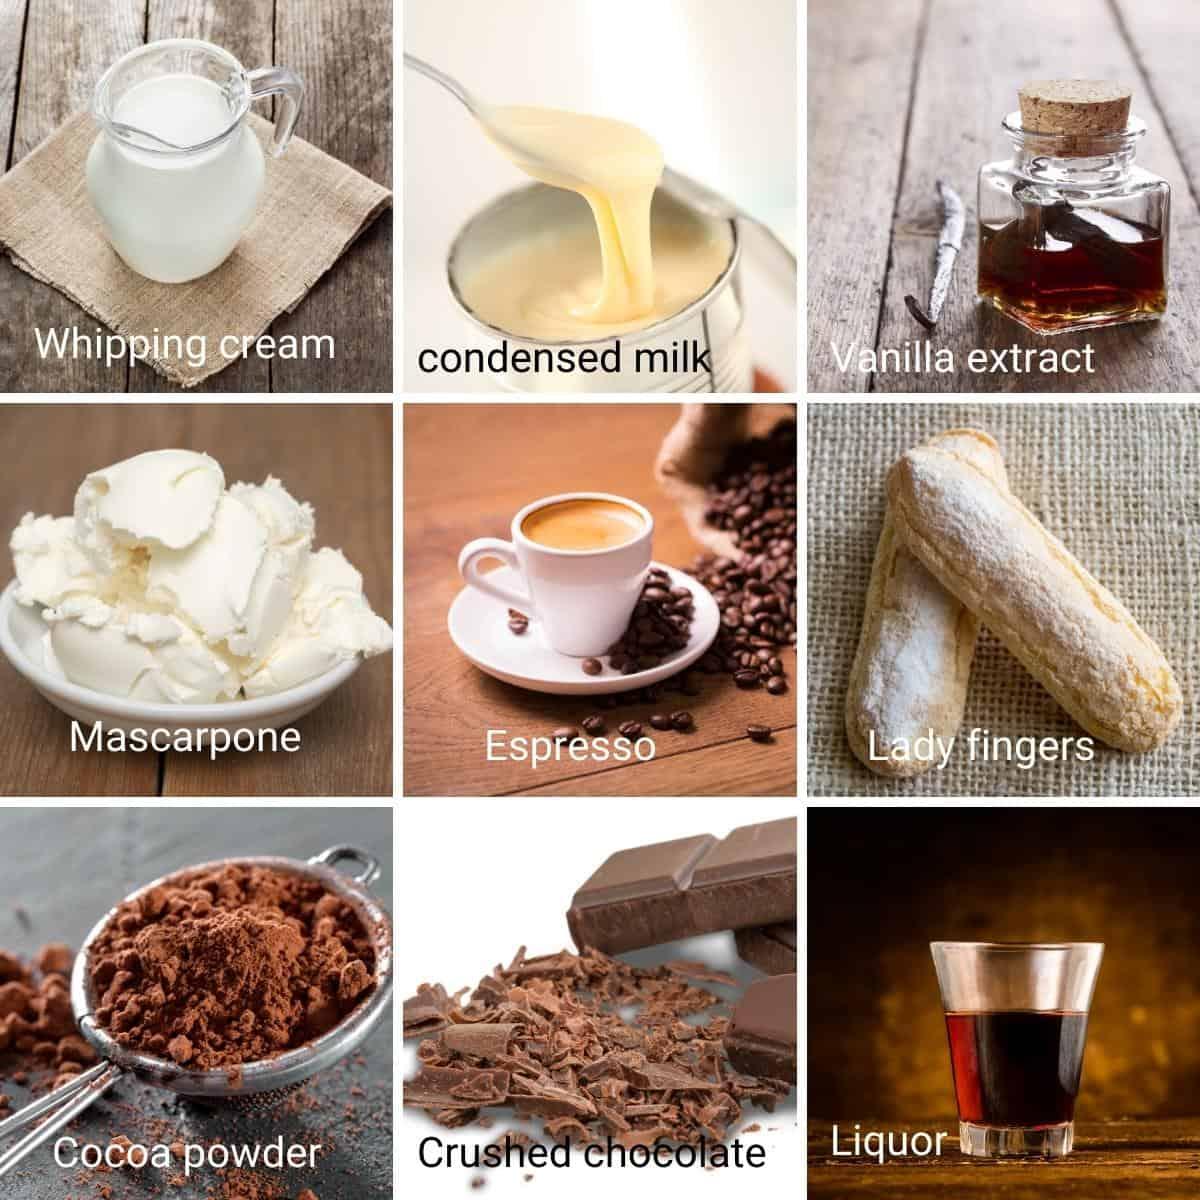 Ingredients shot tiramisu ice cream.